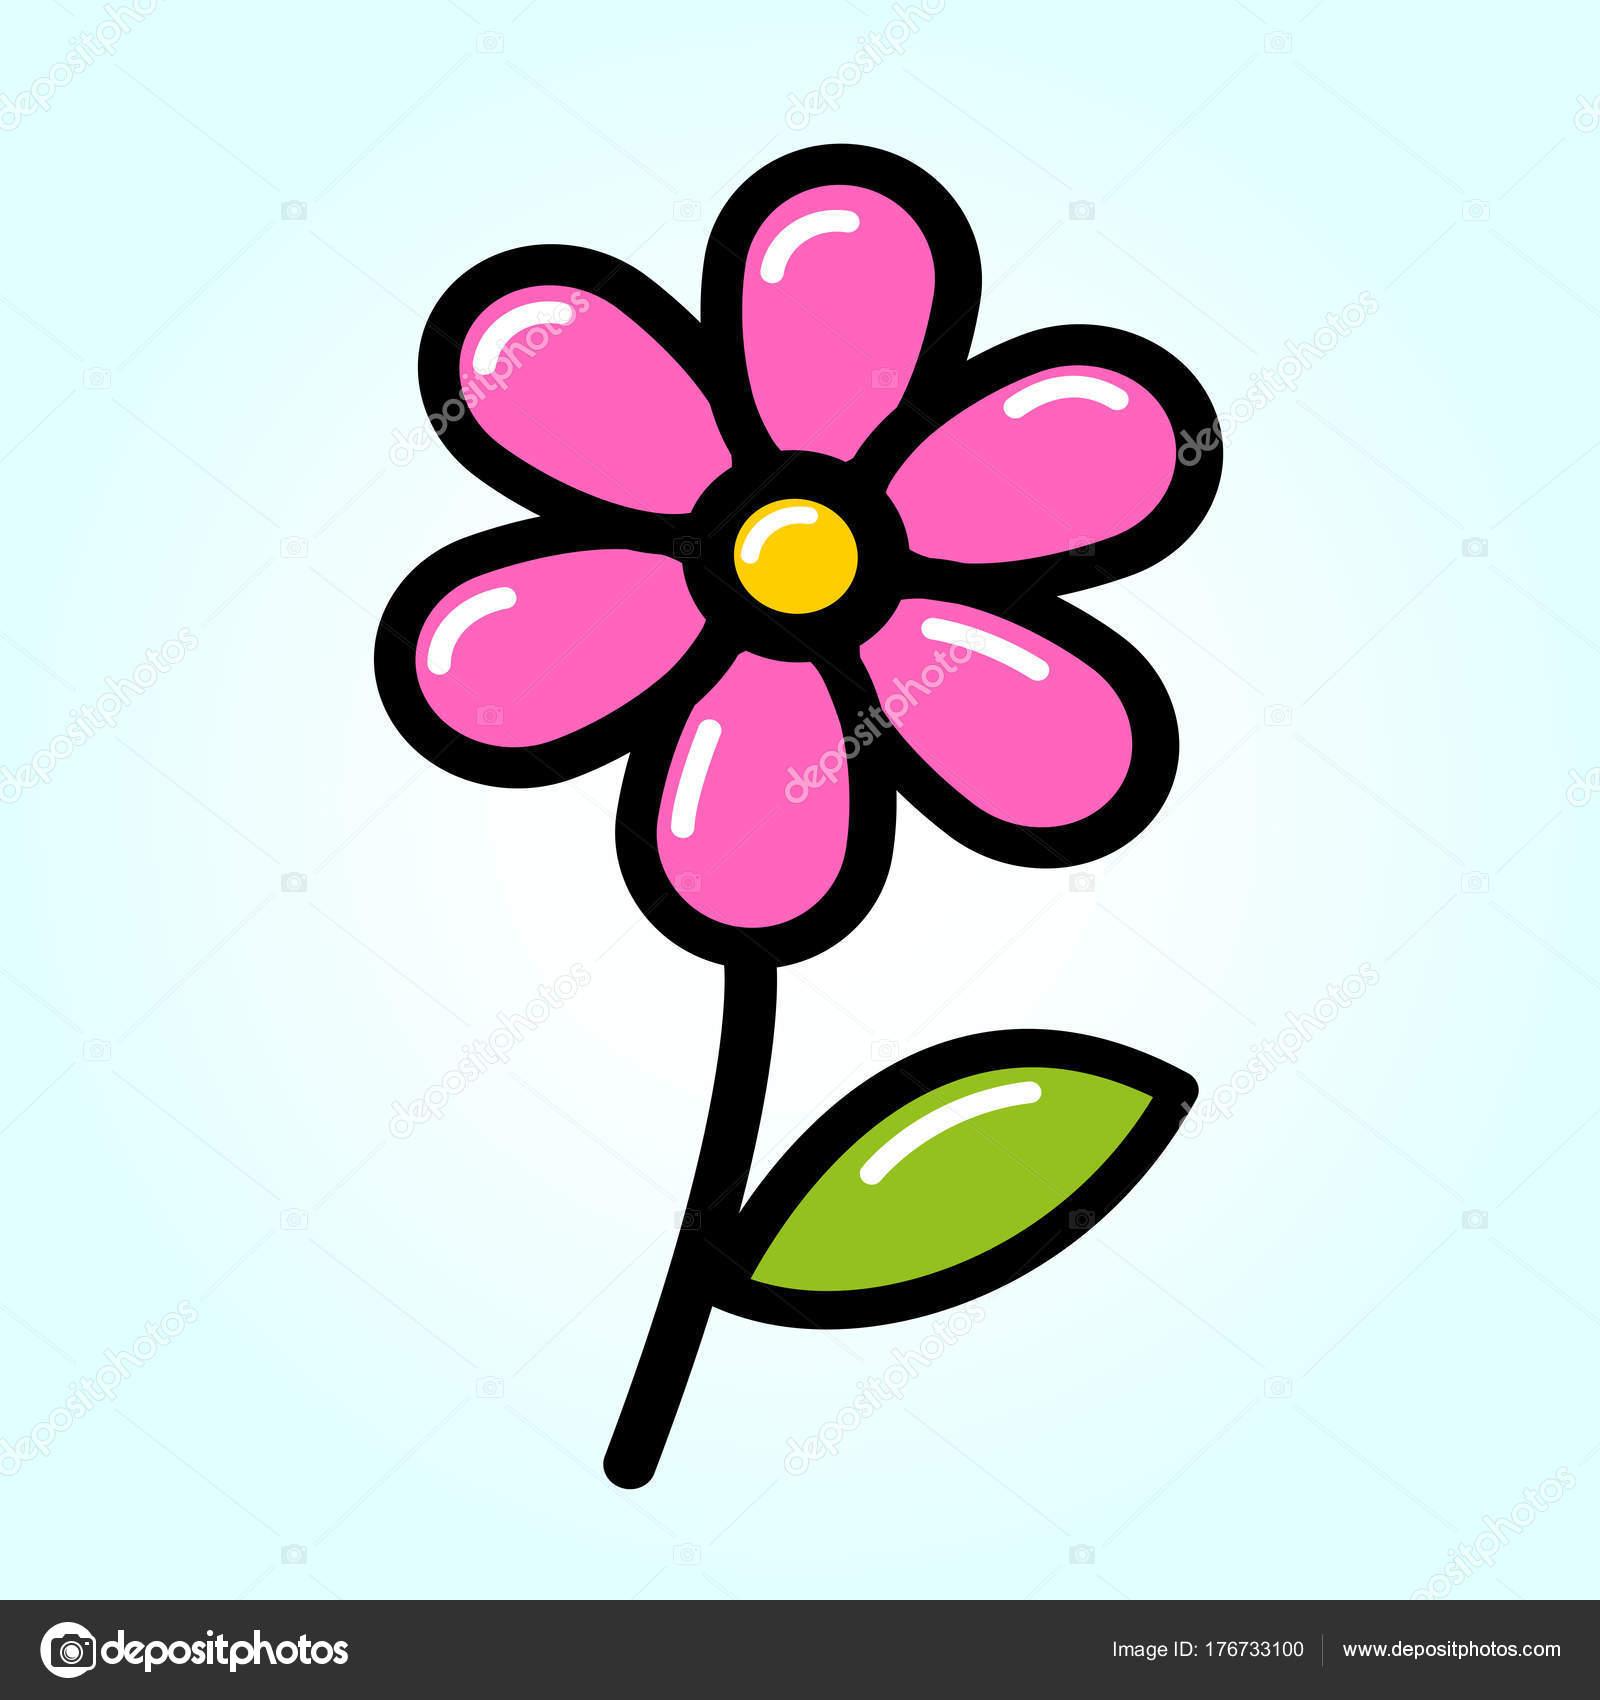 Notion De Dessin Fleur Rose Image Vectorielle Nickylarson C 176733100